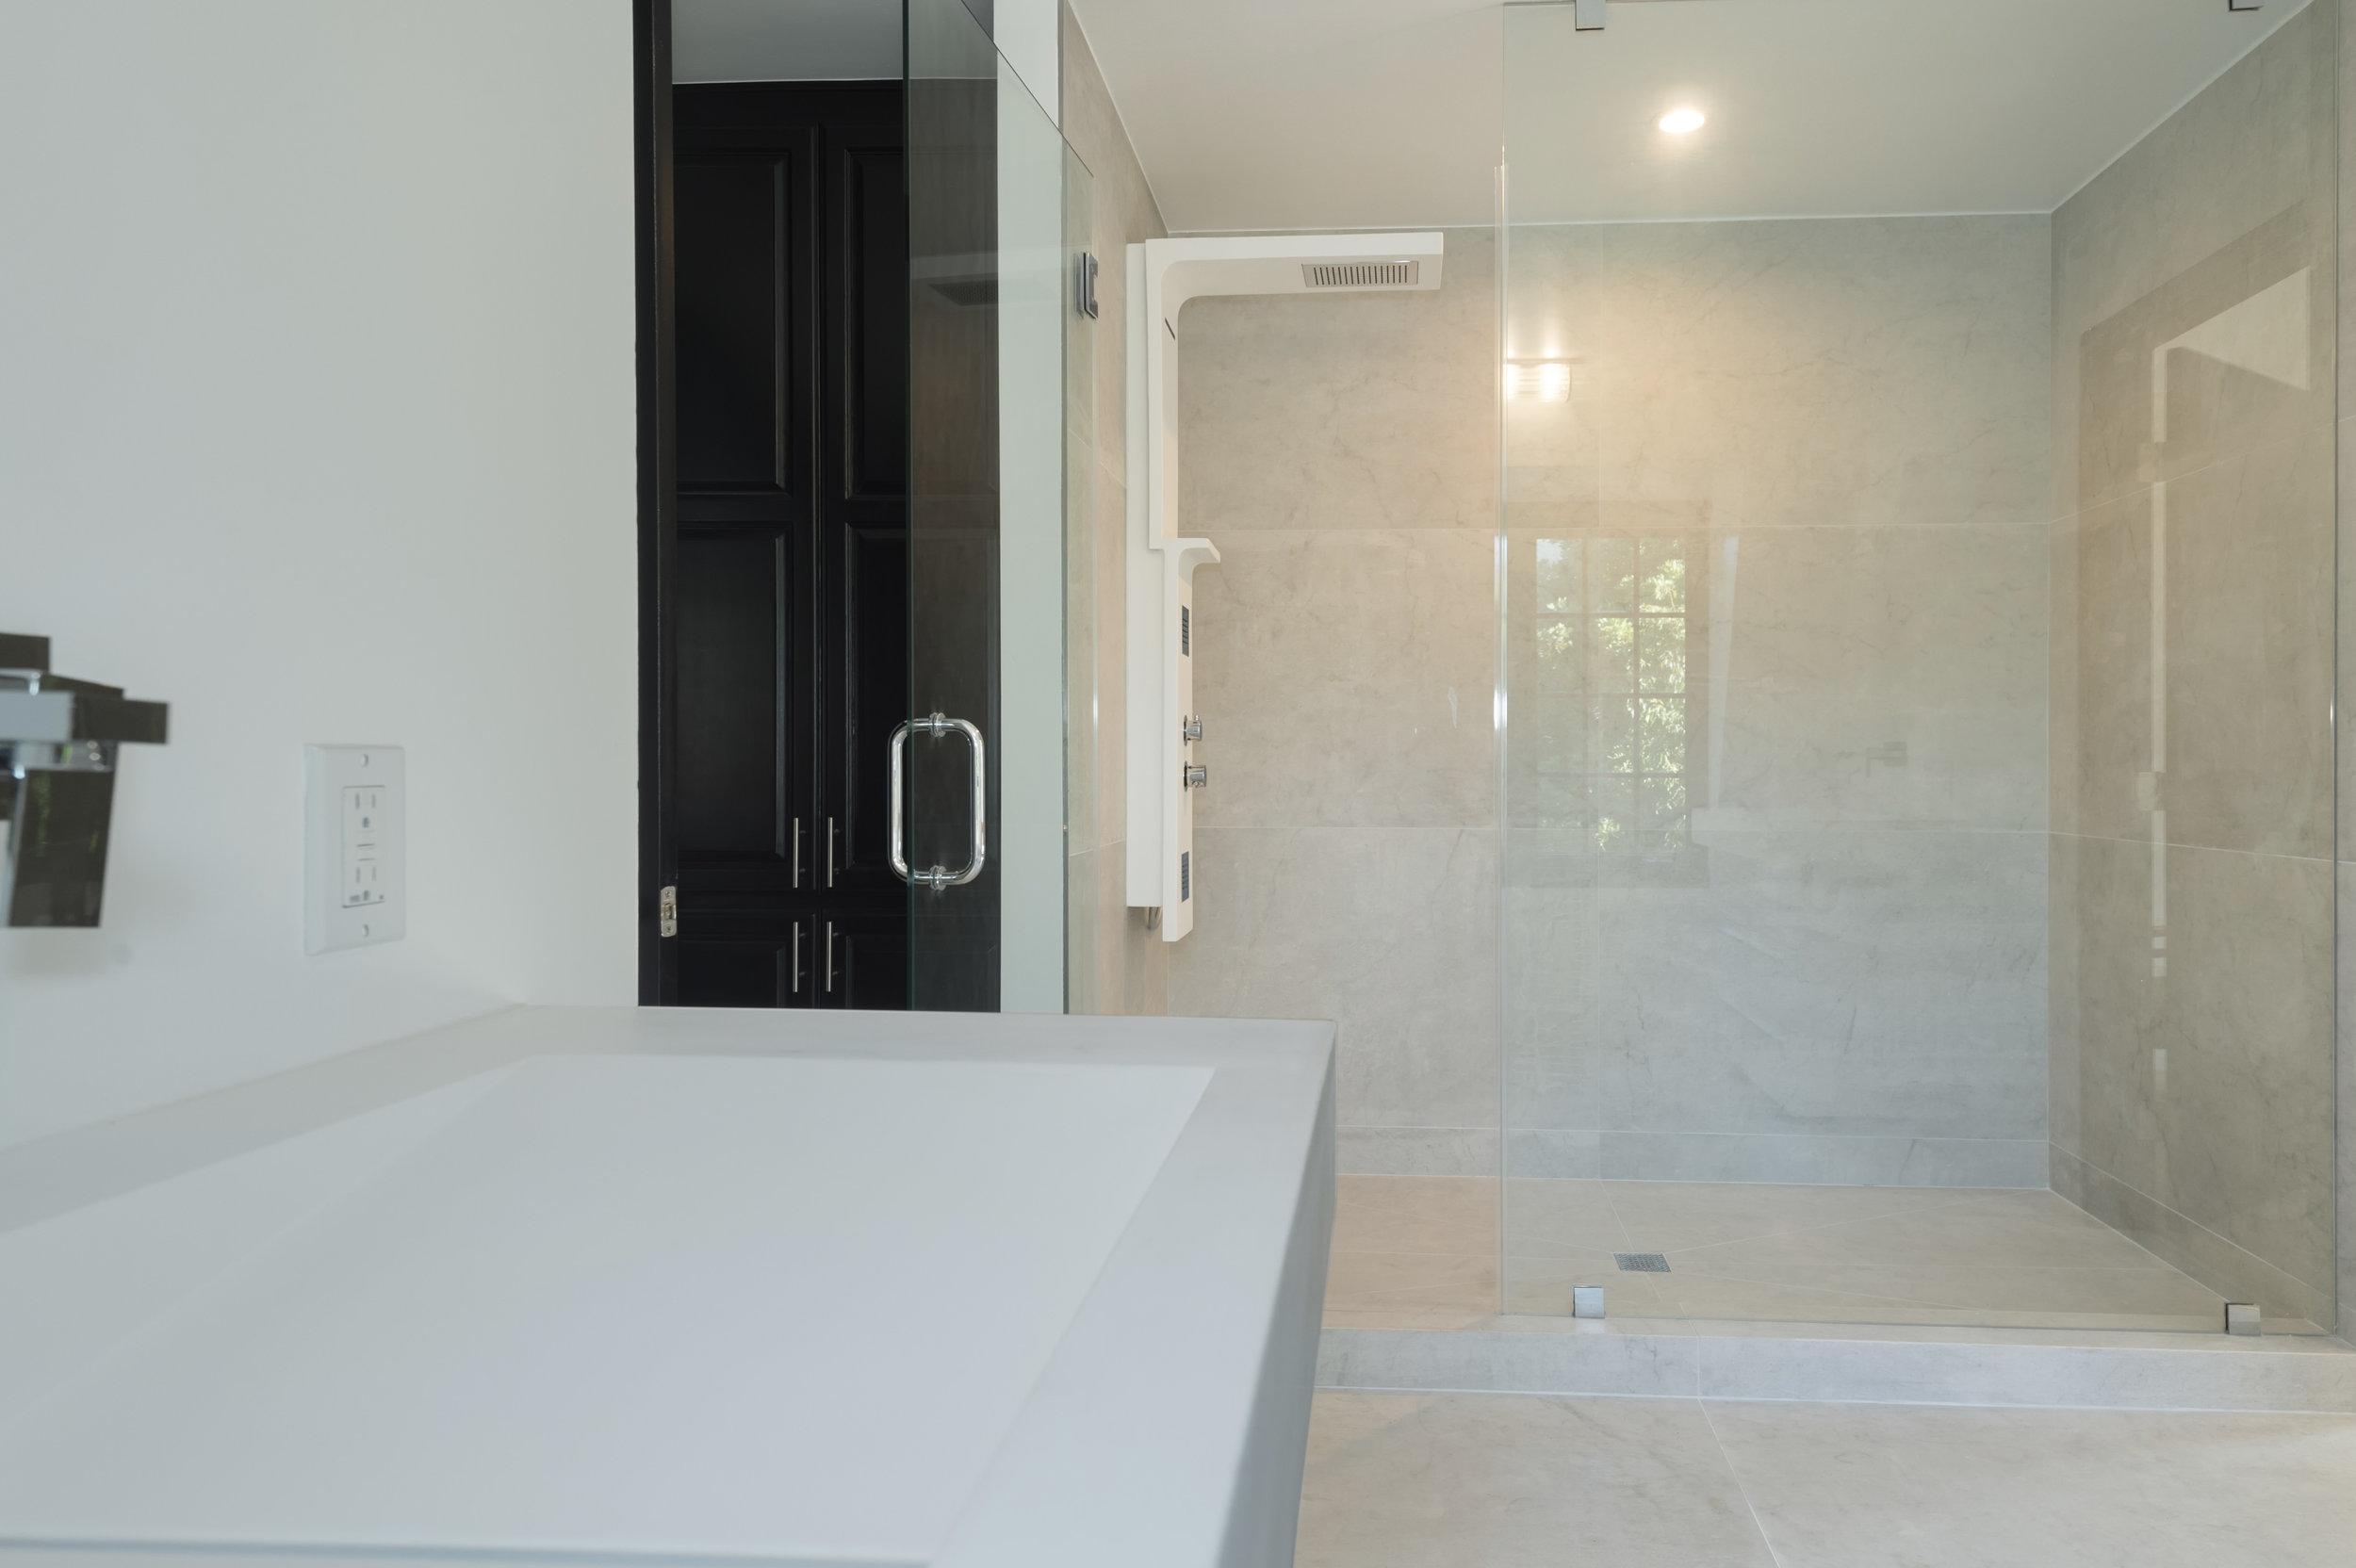 017 bathroom 30340 Morning View Malibu For Sale The Malibu Life Team Luxury Real Estate.jpg